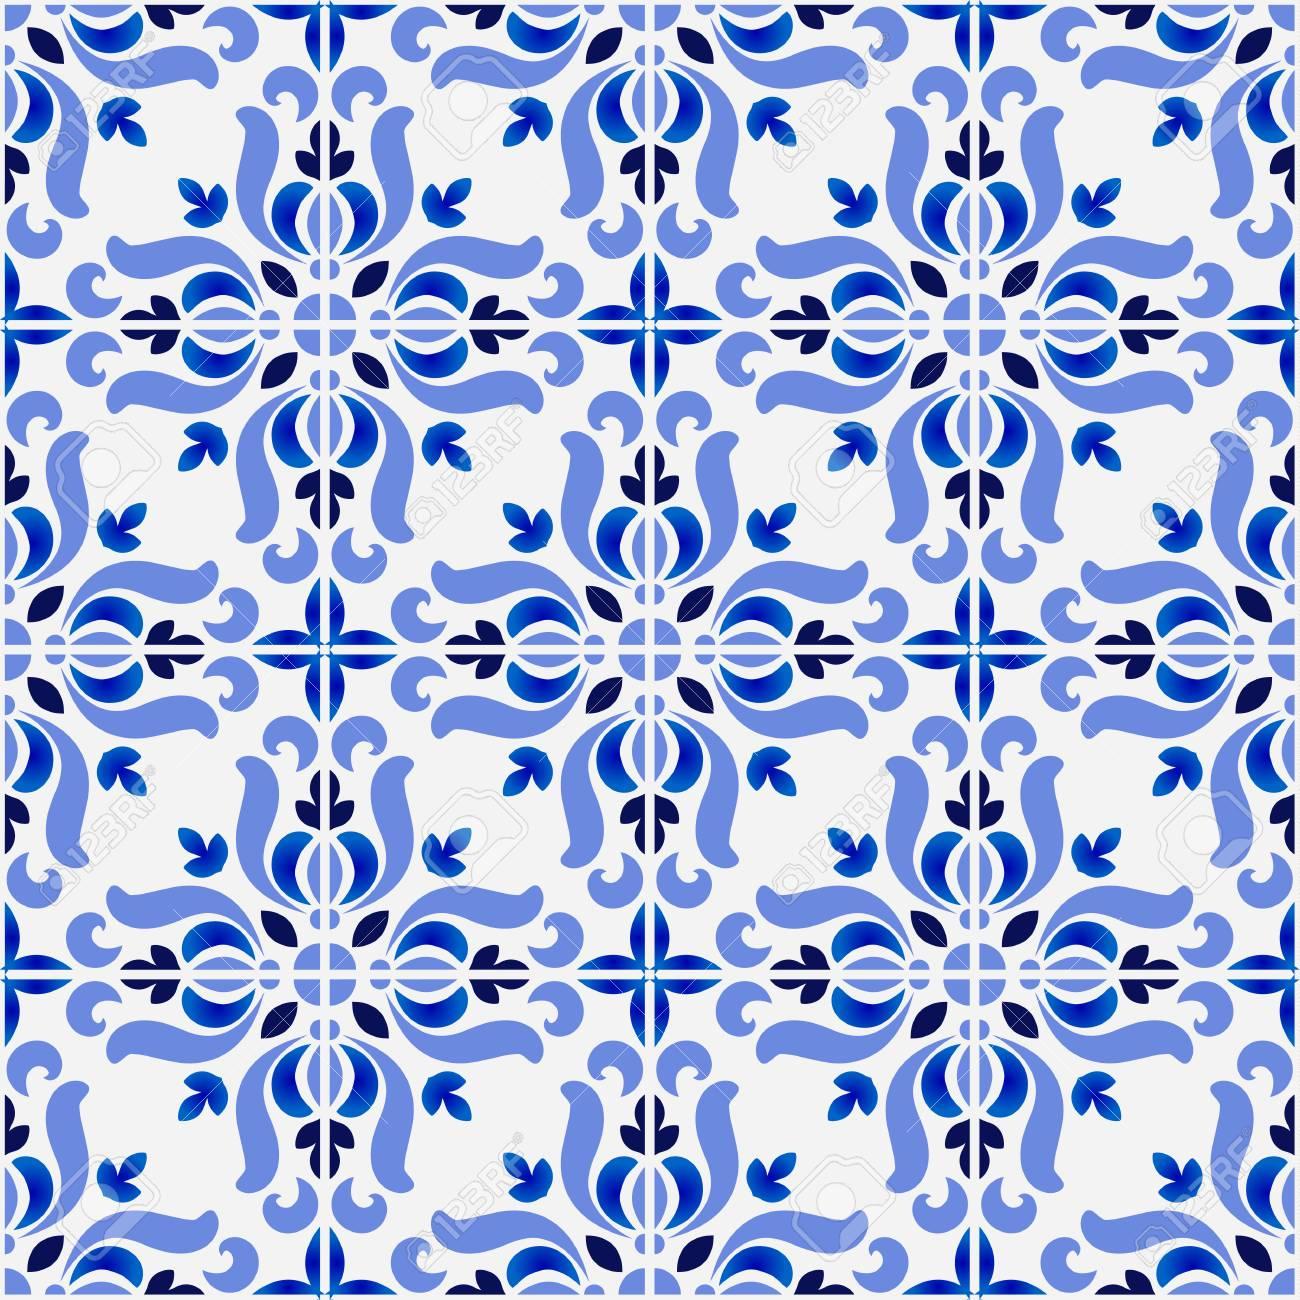 tile pattern, colorful decorative floral seamless background, beautiful ceramic wallpaper decor vector illustration - 123745615